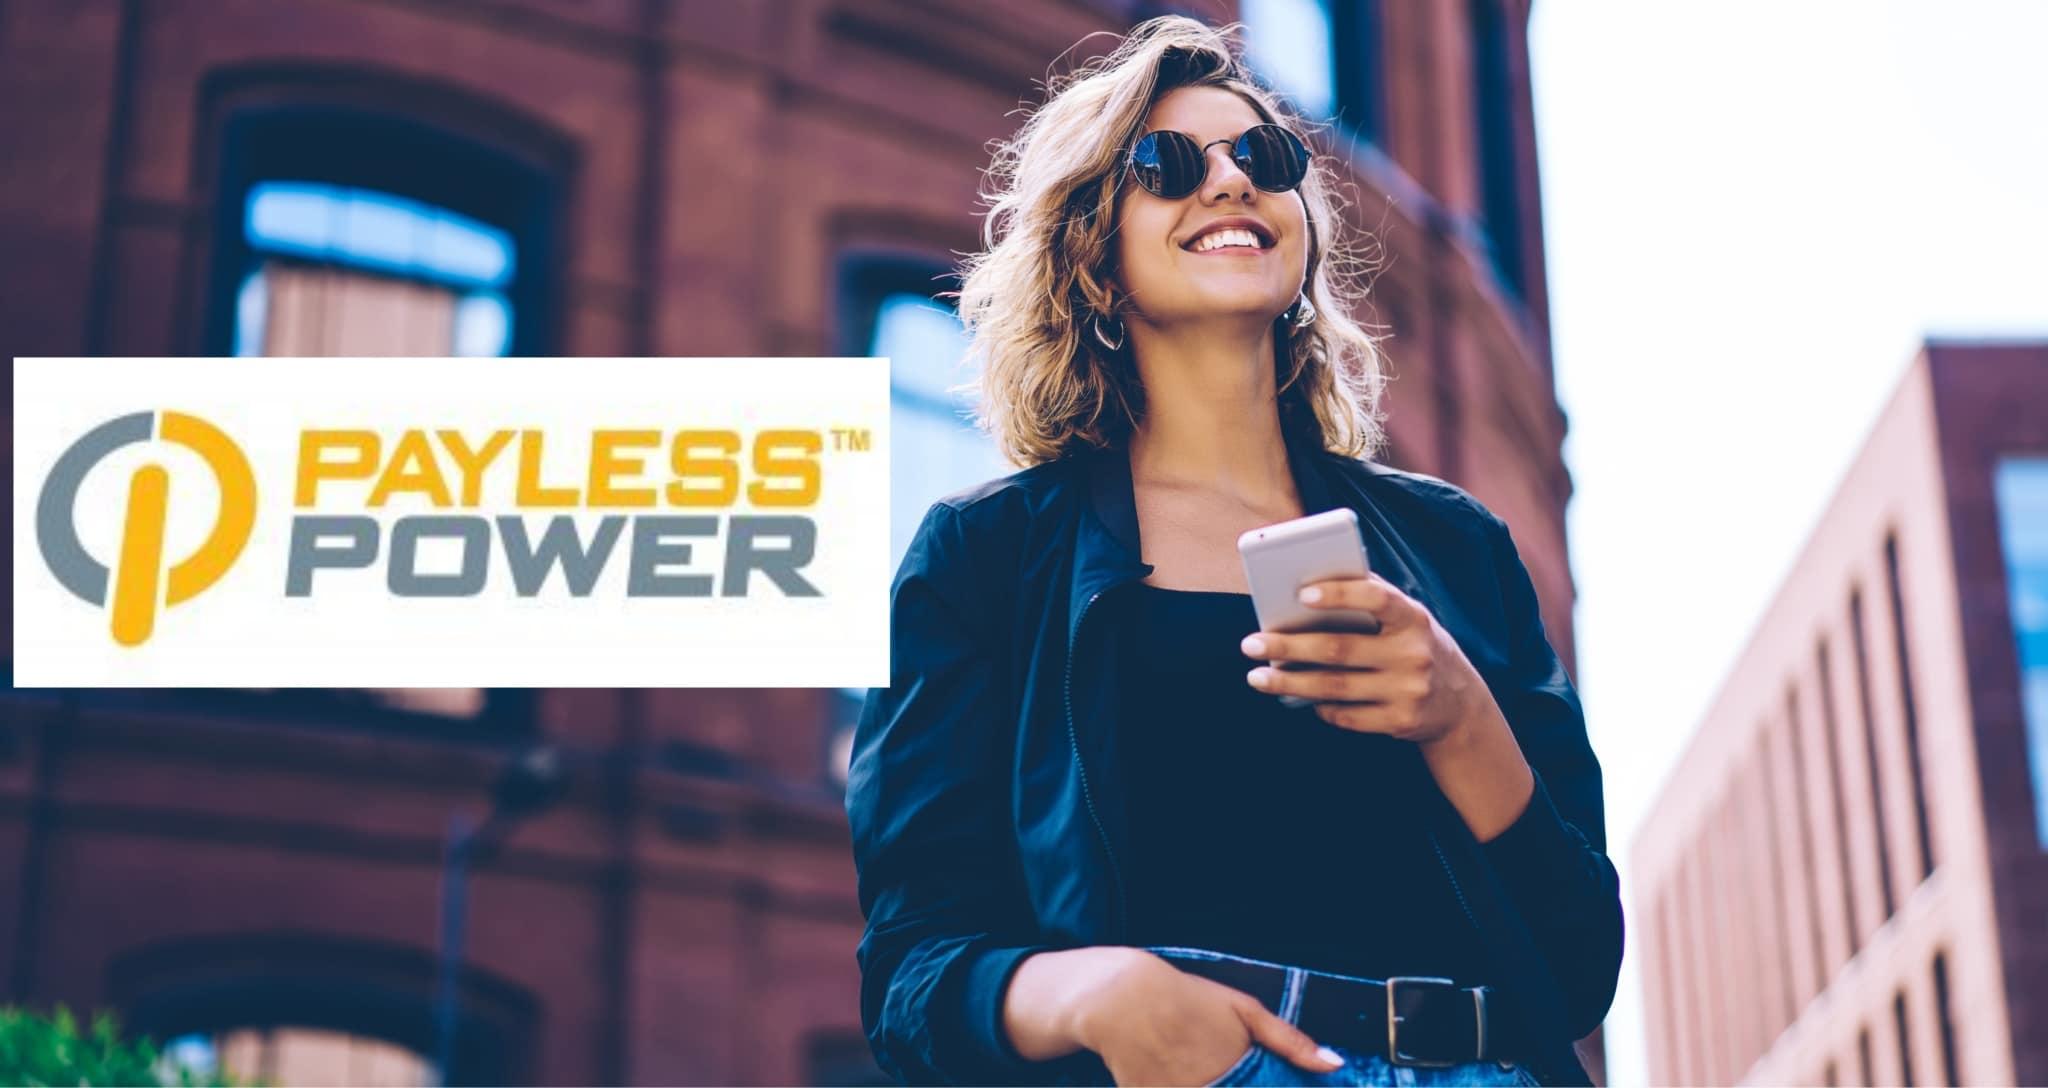 Payless Power Reviews >> Payless Power Texas Prepaid Energy Provider No Deposit